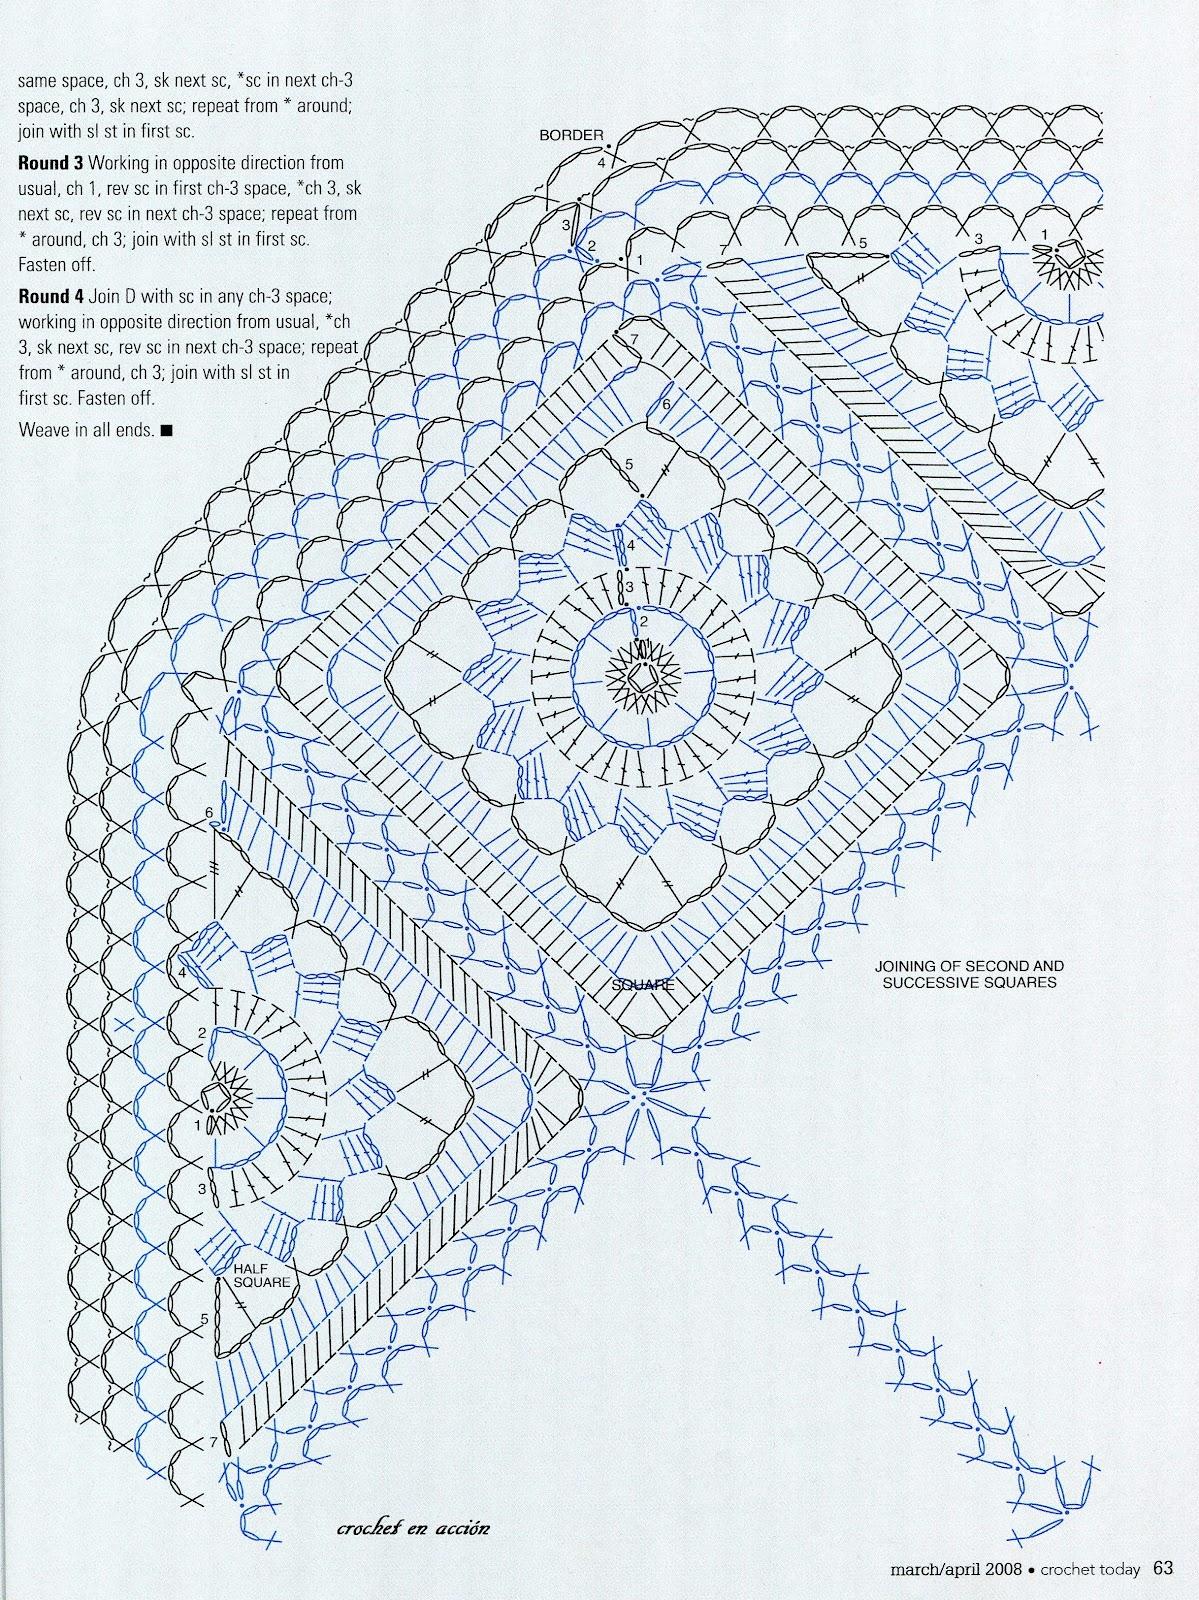 Ergahandmade Crochet Blanket Diagrams Free Pattern Squarecrochetmotifpatterndiagram Http Ergahandmadeblogspotgr 2015 06 Stitcheshtml Via Crochetenaccionblogspotgr 2012 05 Un Rayito De Sol Entre Tonos Azuleshtml